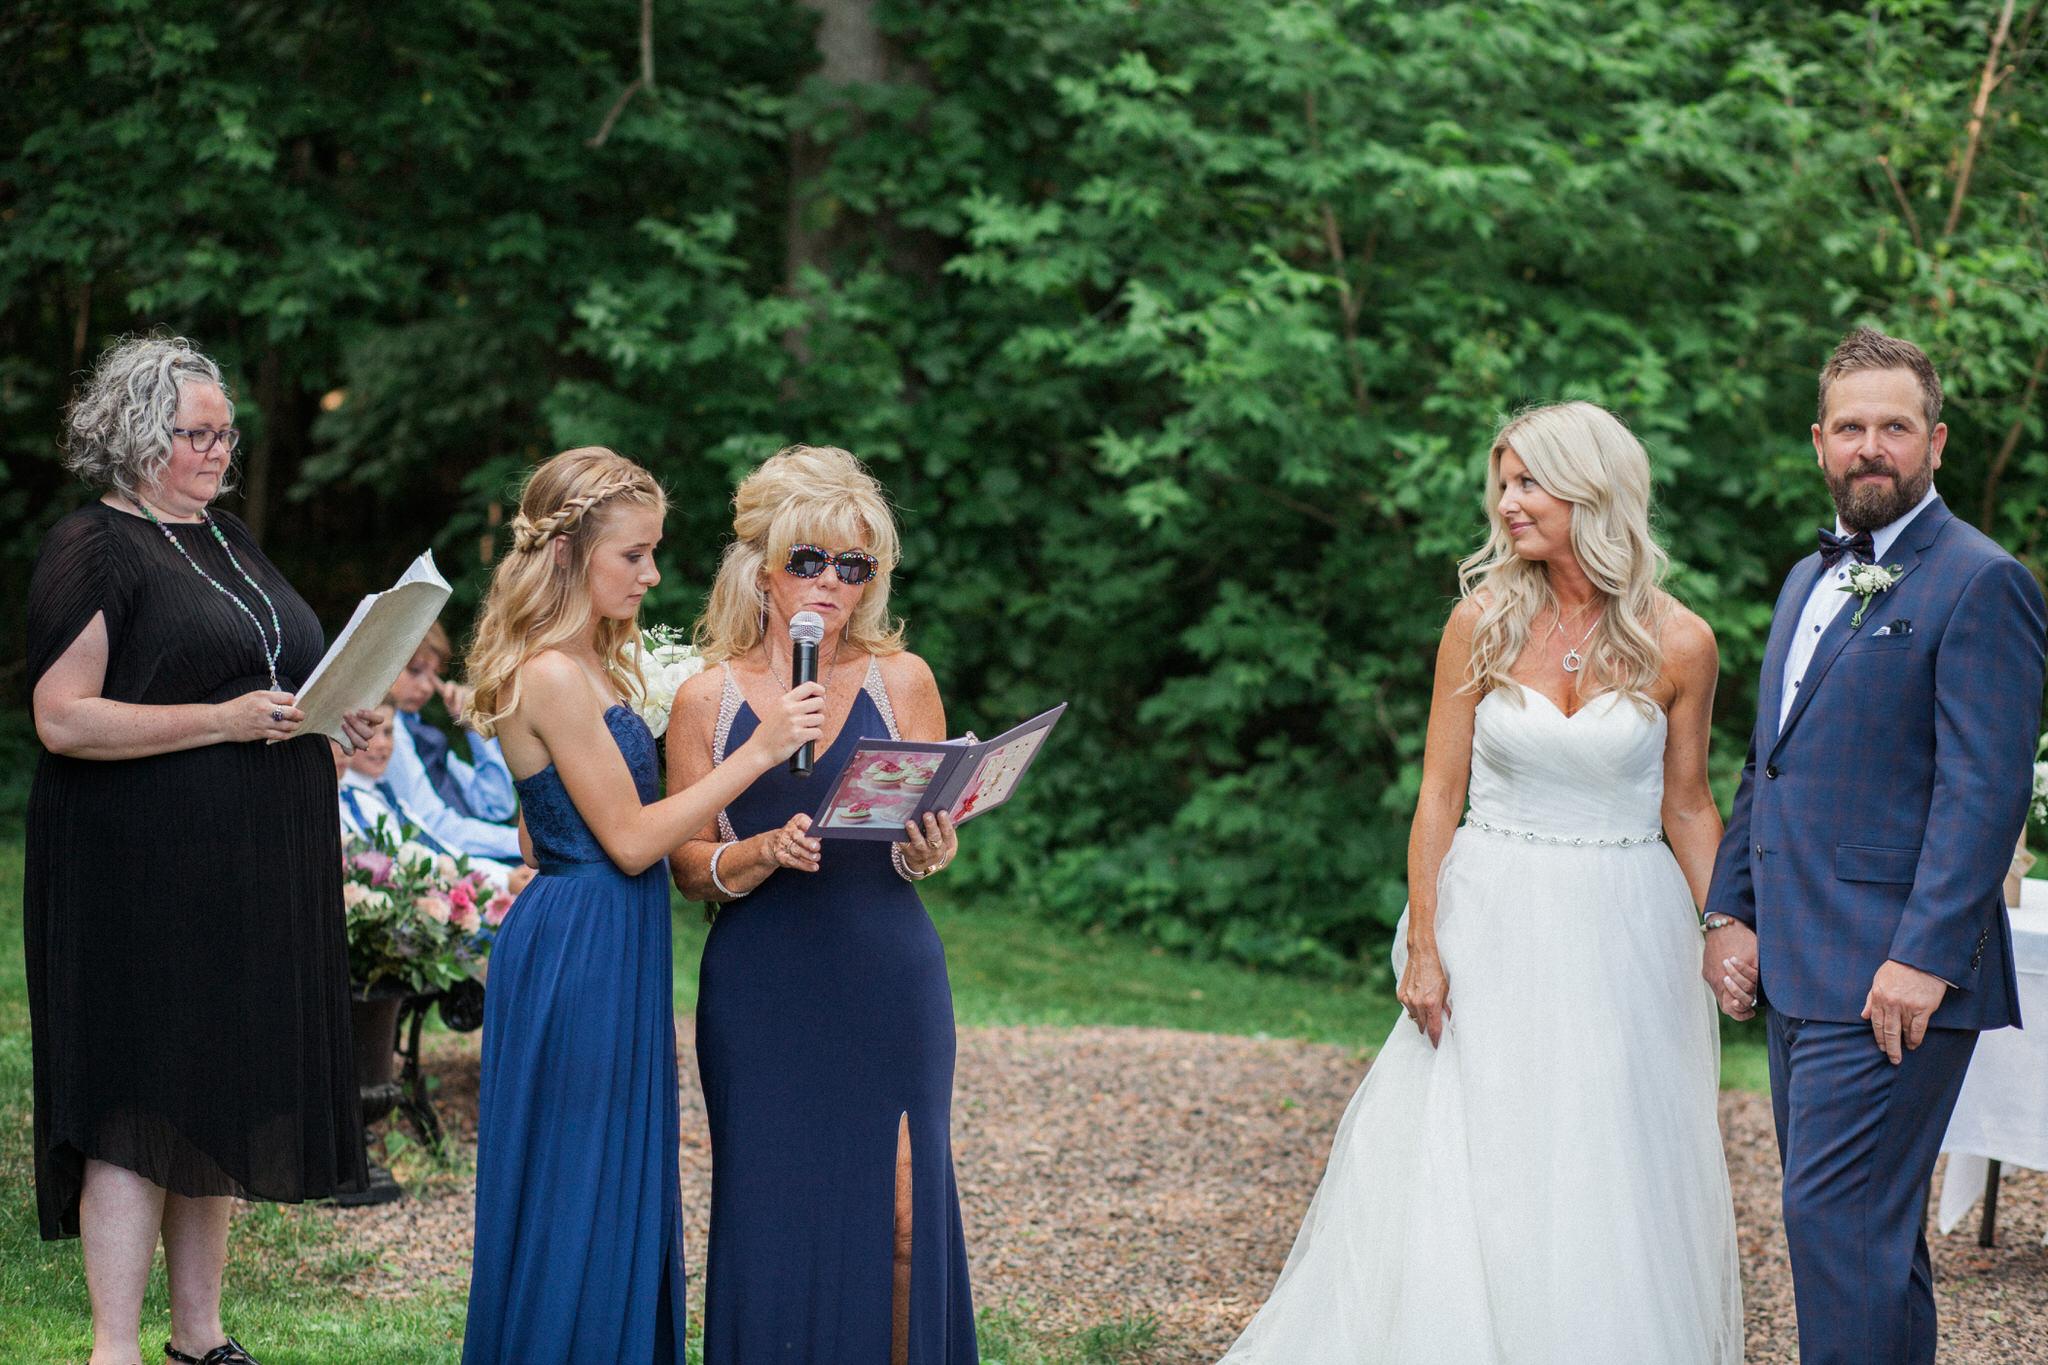 Harvest Restaurant Wedding Brooklin Ontario - speeches during the outdoor ceremony